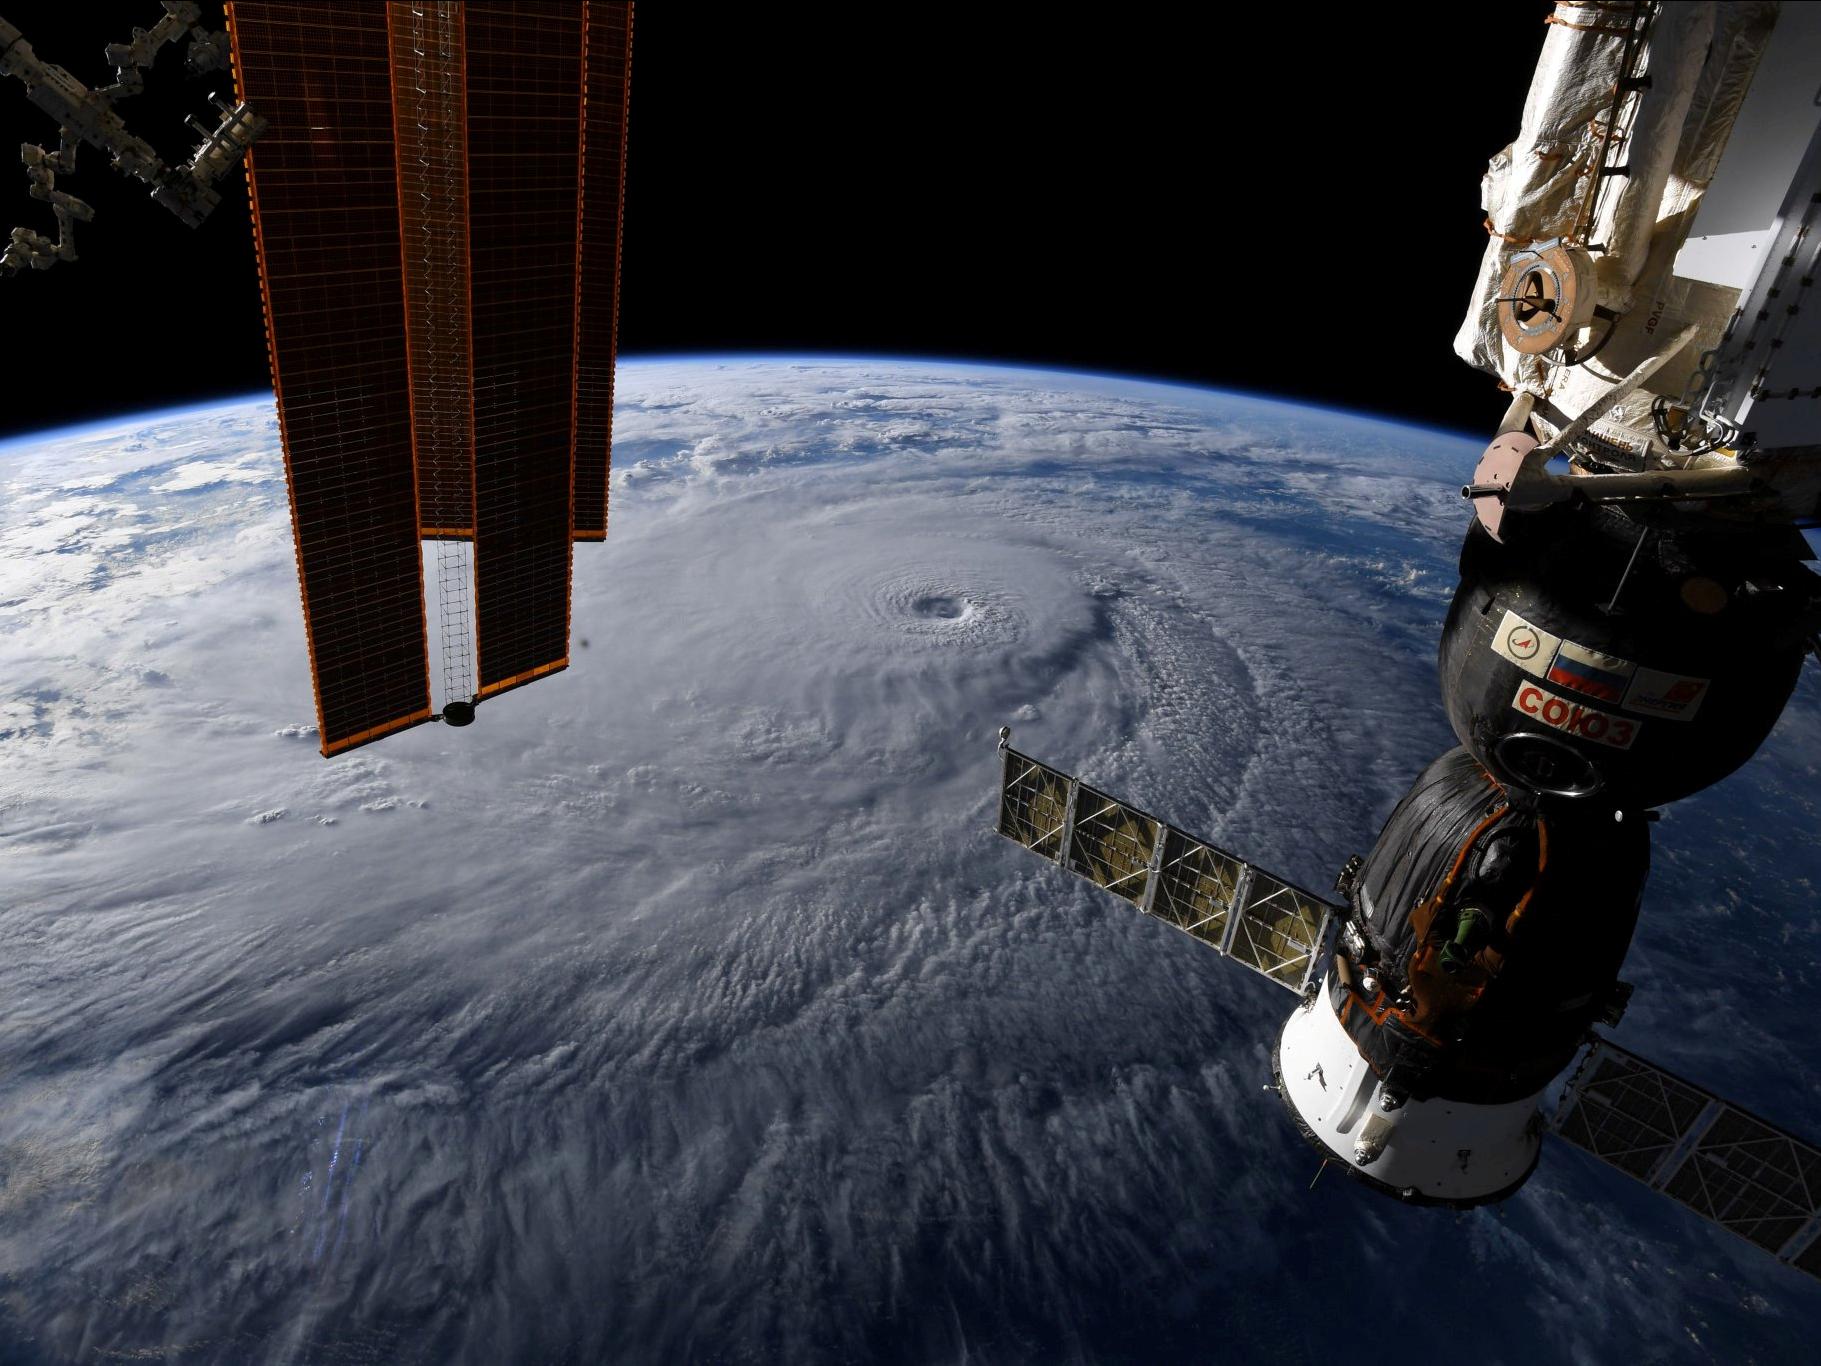 space station leak - HD1793×1345